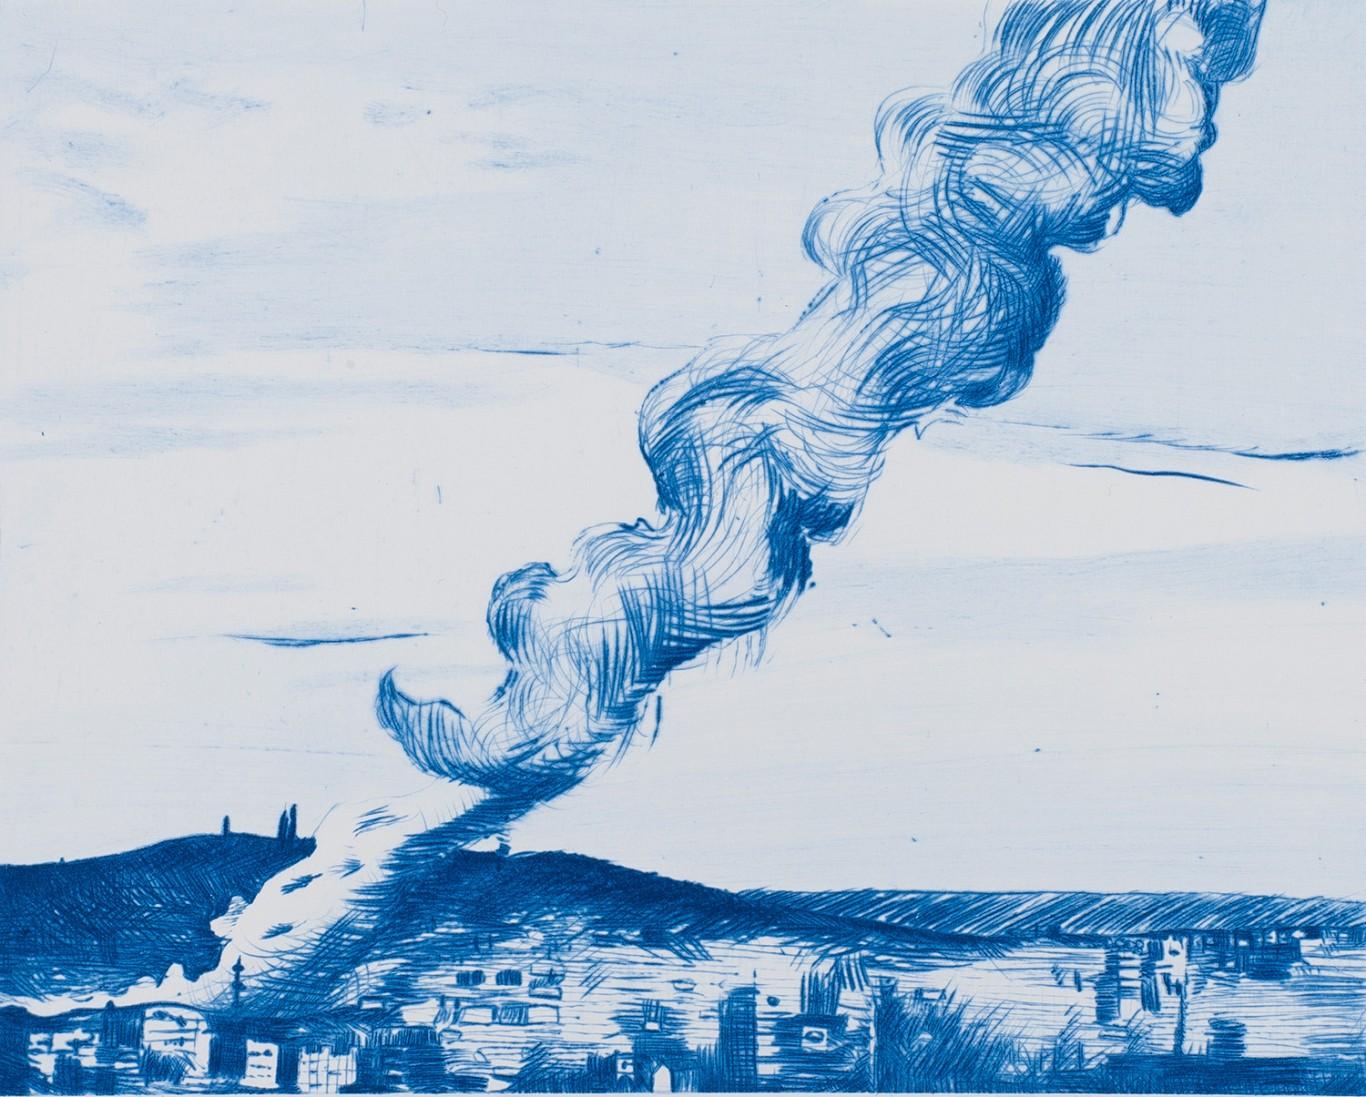 Matthew Hindley, <i>Ruin lust III</i>, 2016. Drypoint, 28 x 33 cm